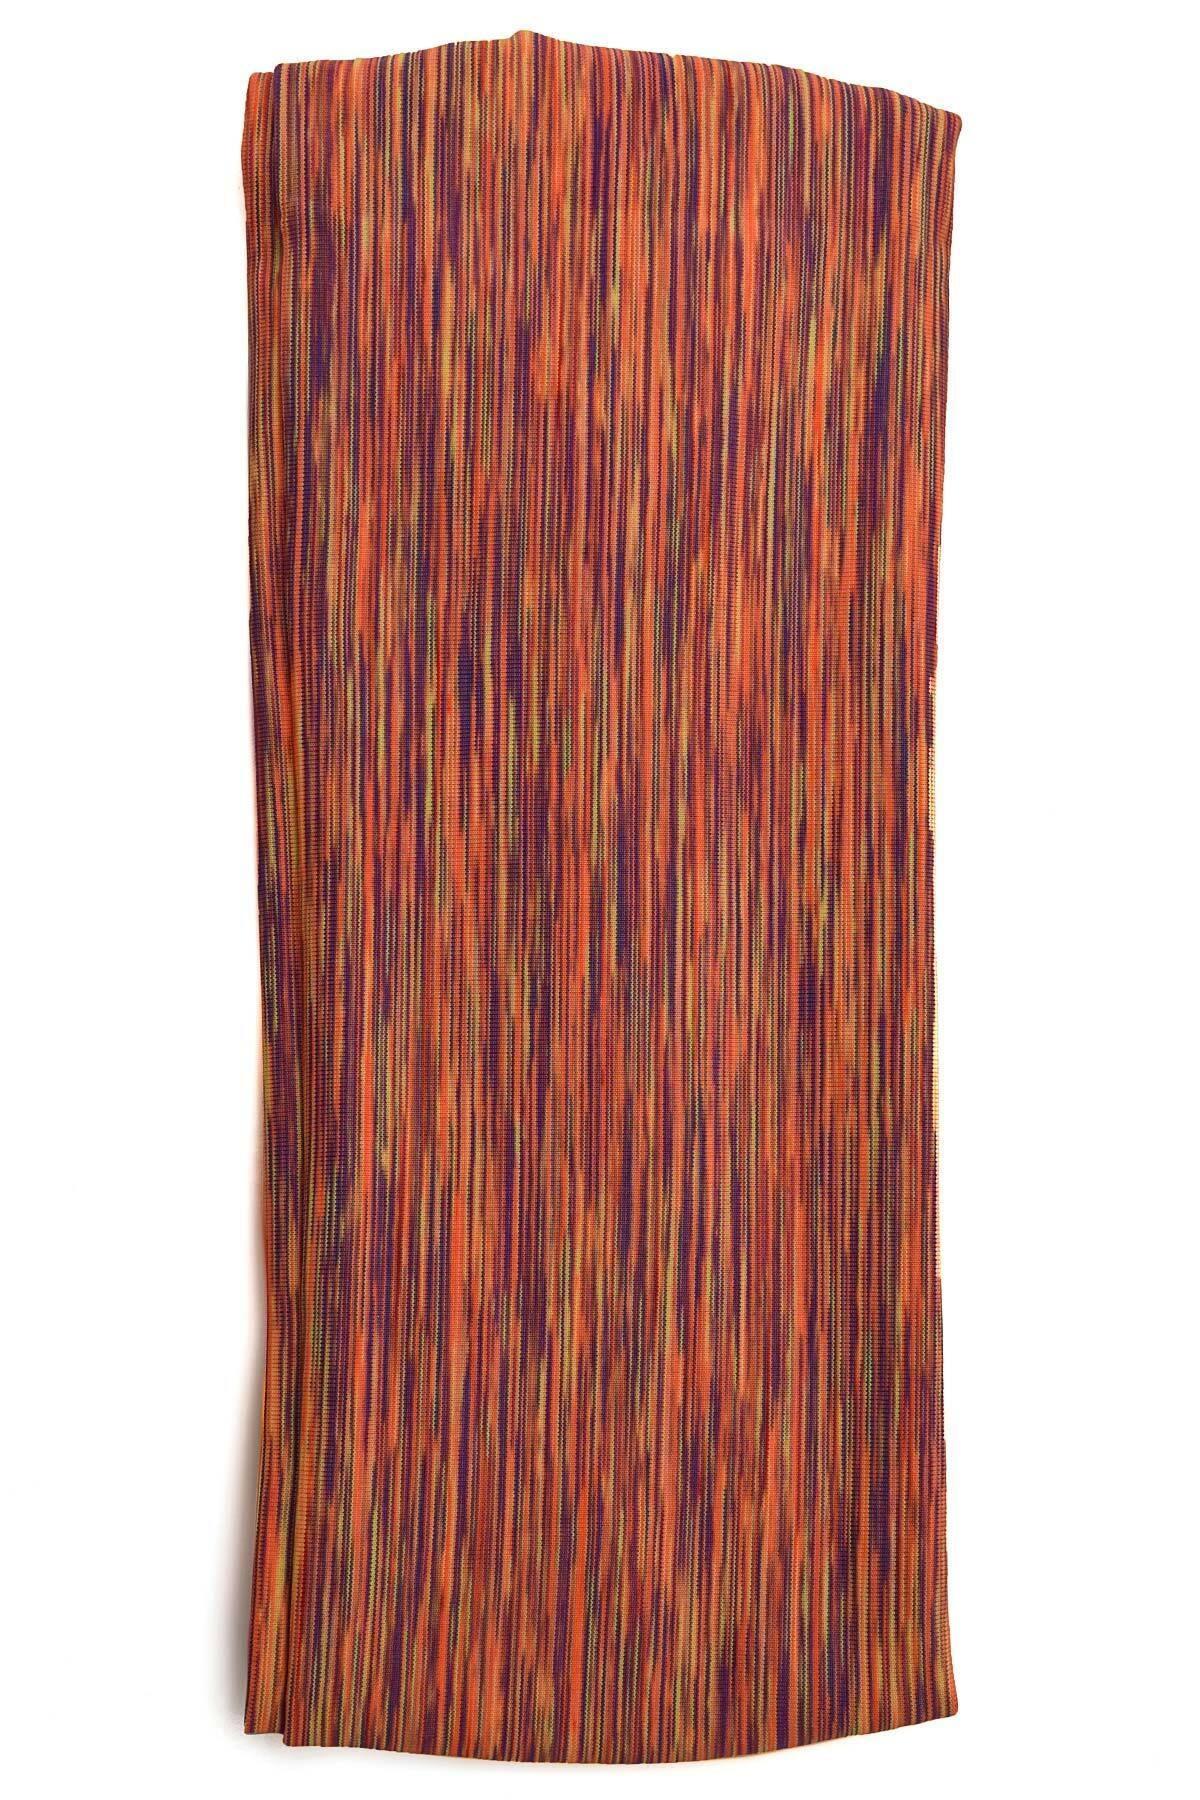 bilcee Turuncu Saç Bandı CB-0764 1